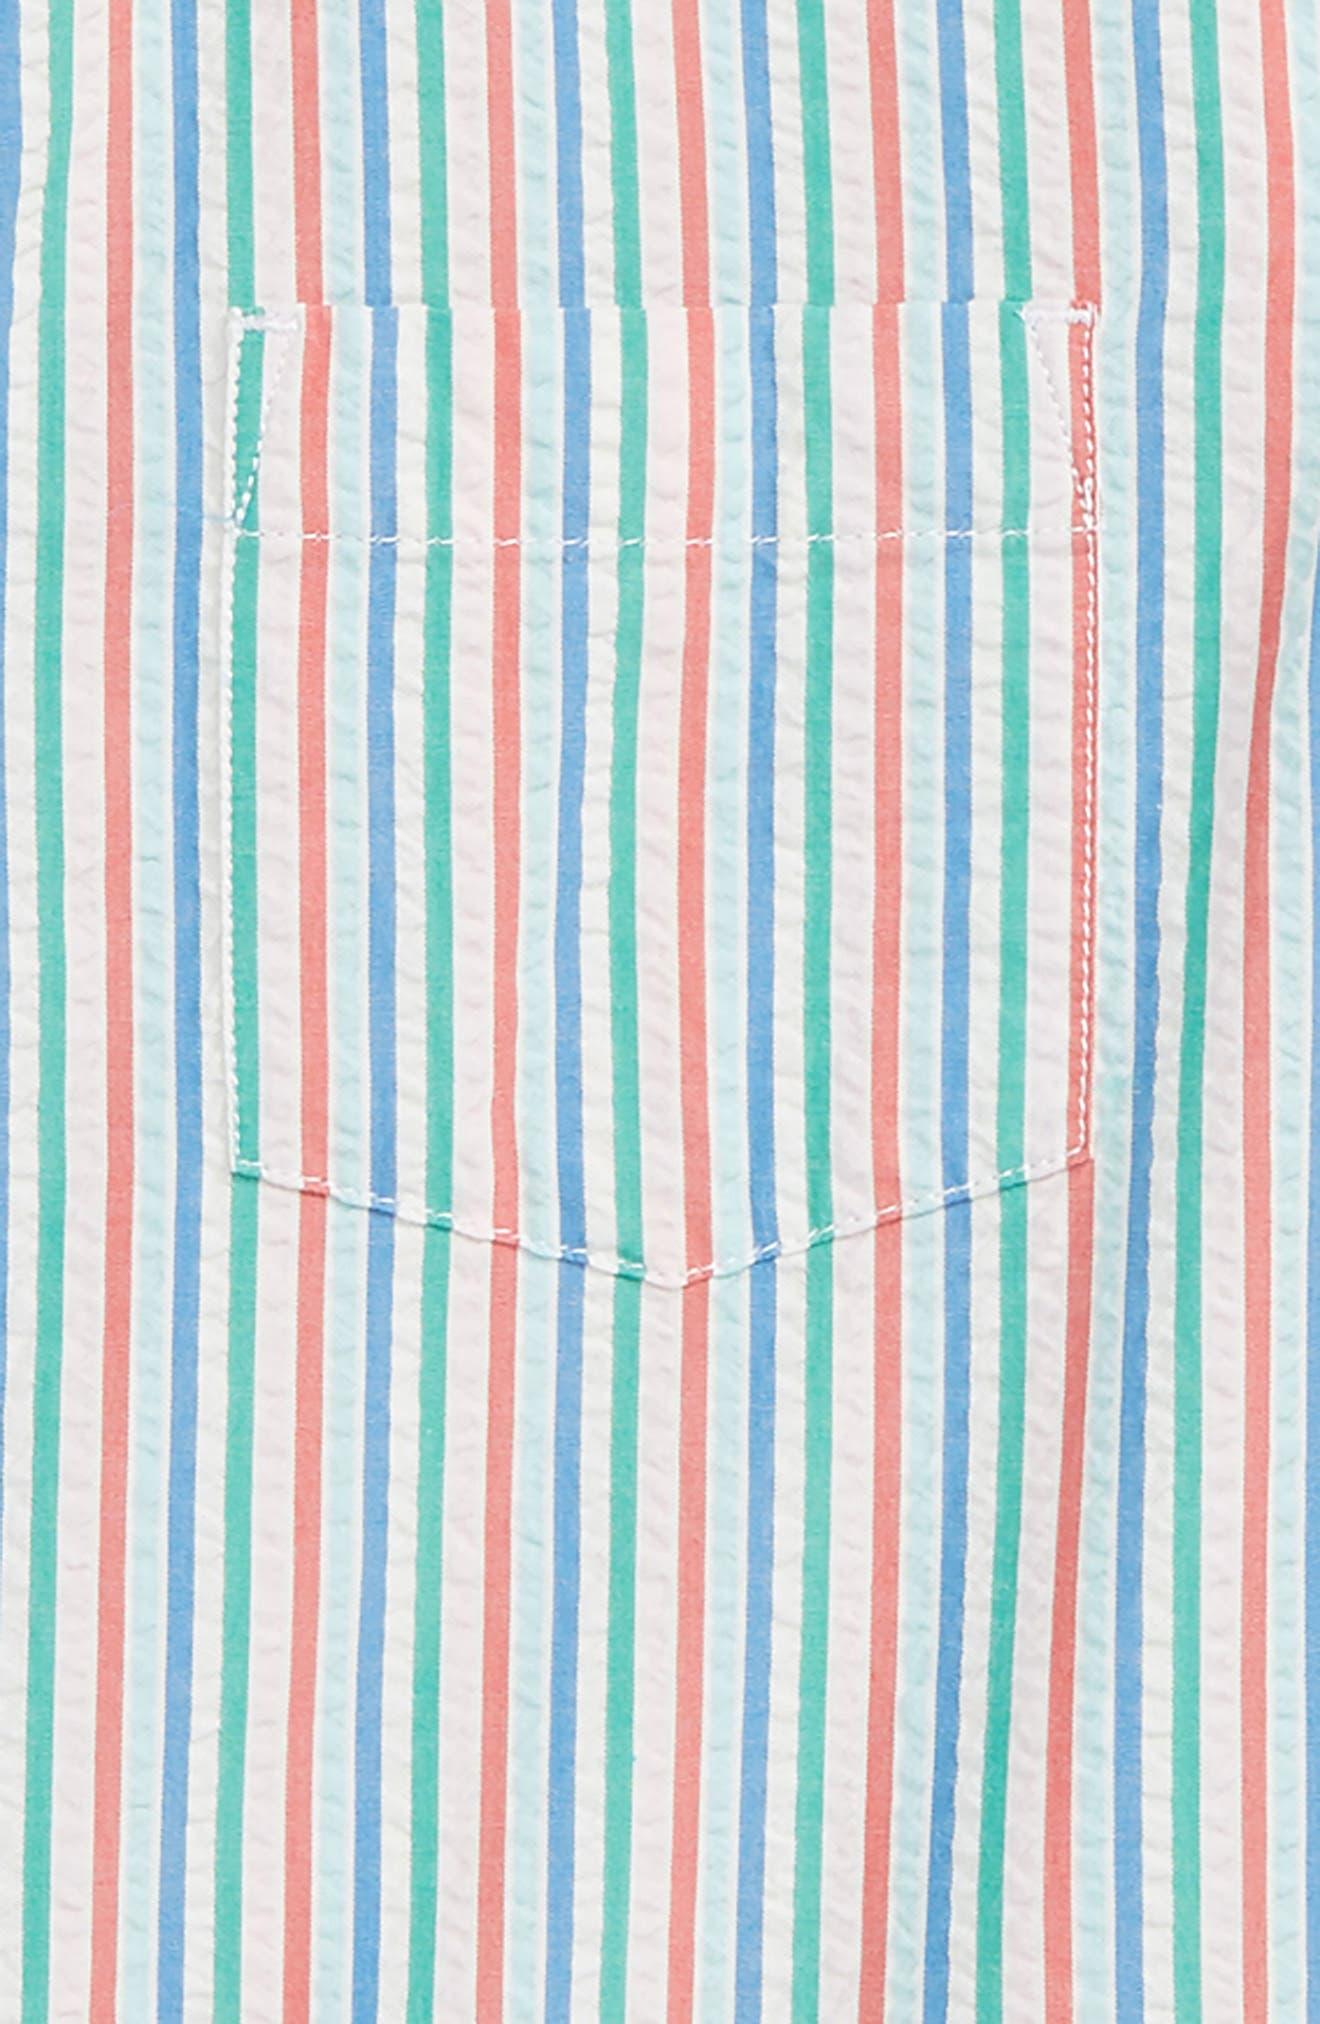 CREWCUTS BY J.CREW,                             Seersucker Shirt,                             Alternate thumbnail 2, color,                             MAR VISTA IVORY MULTI